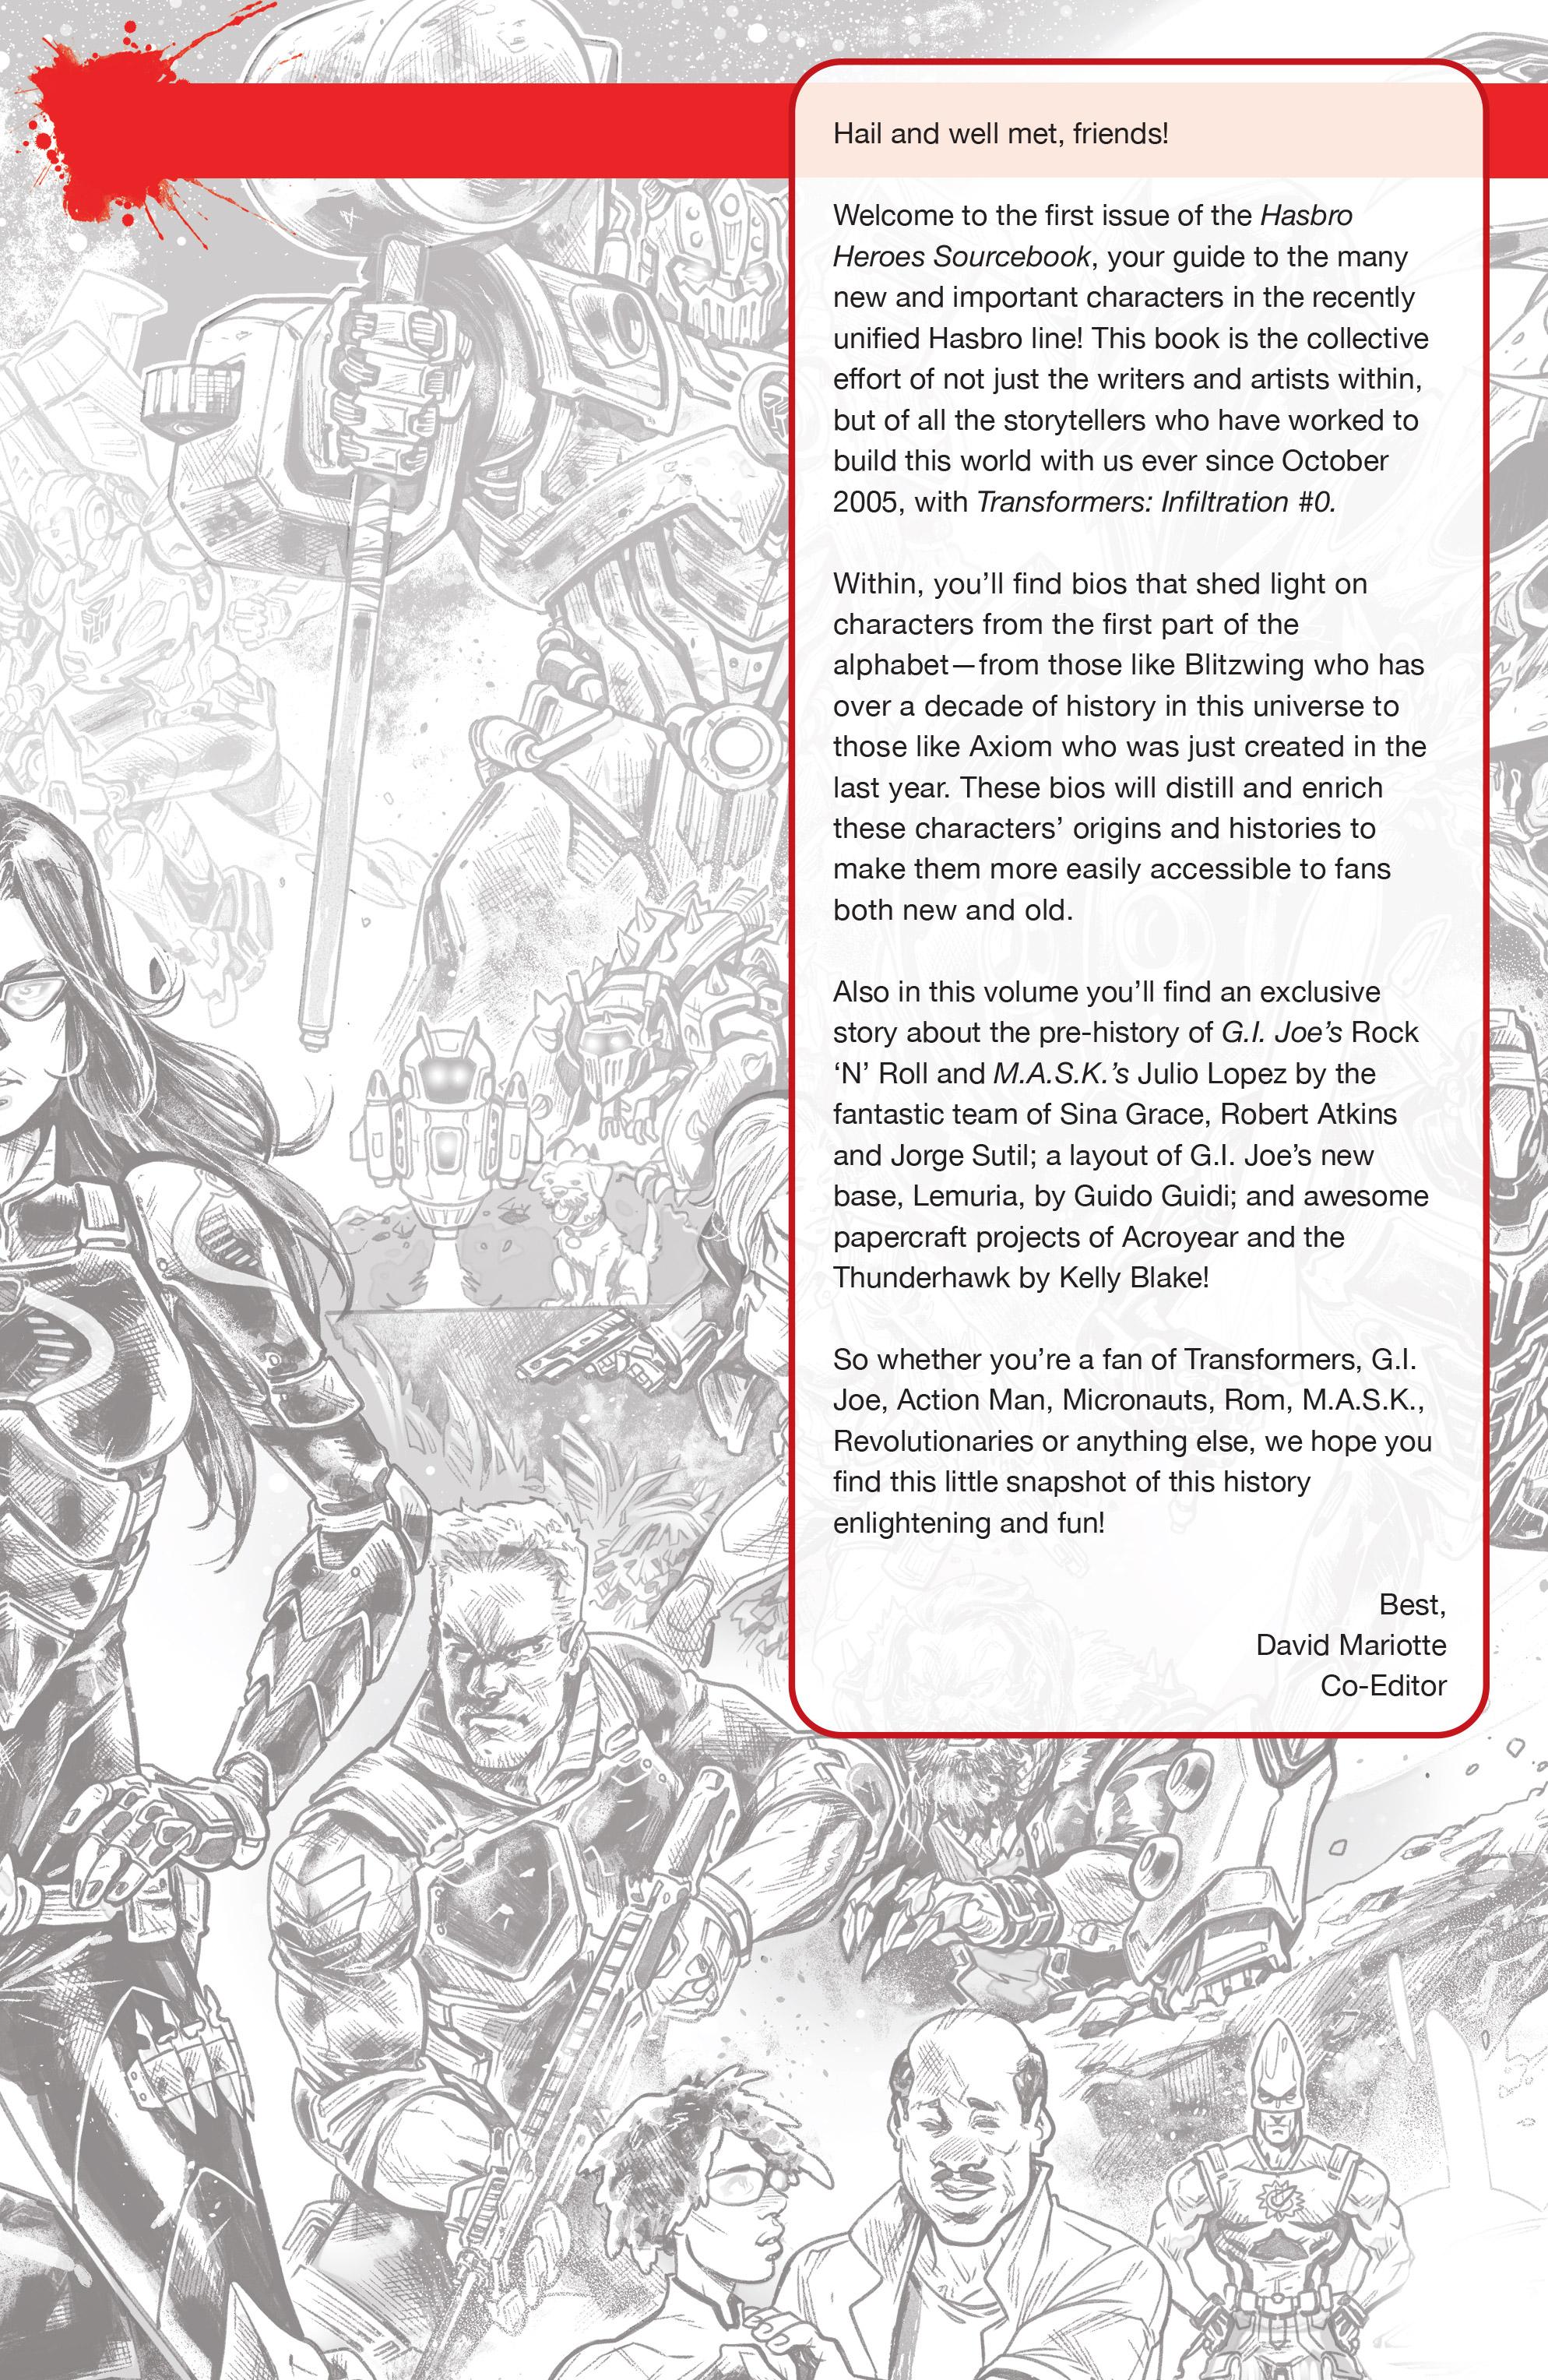 Read online Hasbro Heroes Sourcebook comic -  Issue #1 - 3